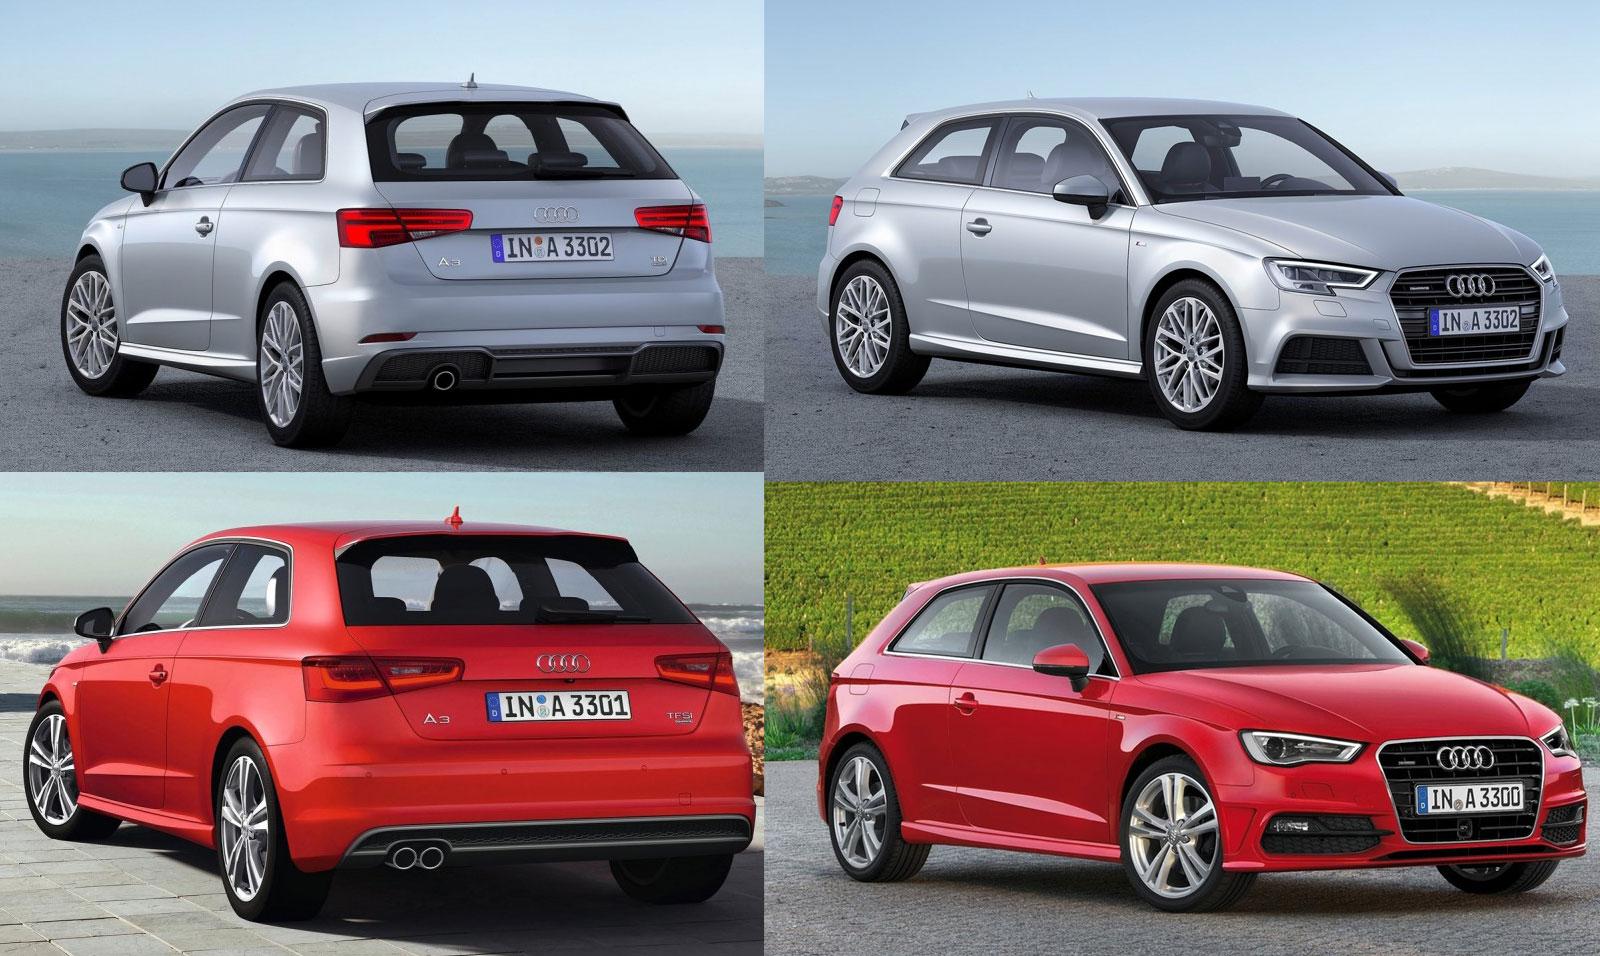 Audi A3 2016 vs. 2012: zoek de verschillen   CARBLOGGER